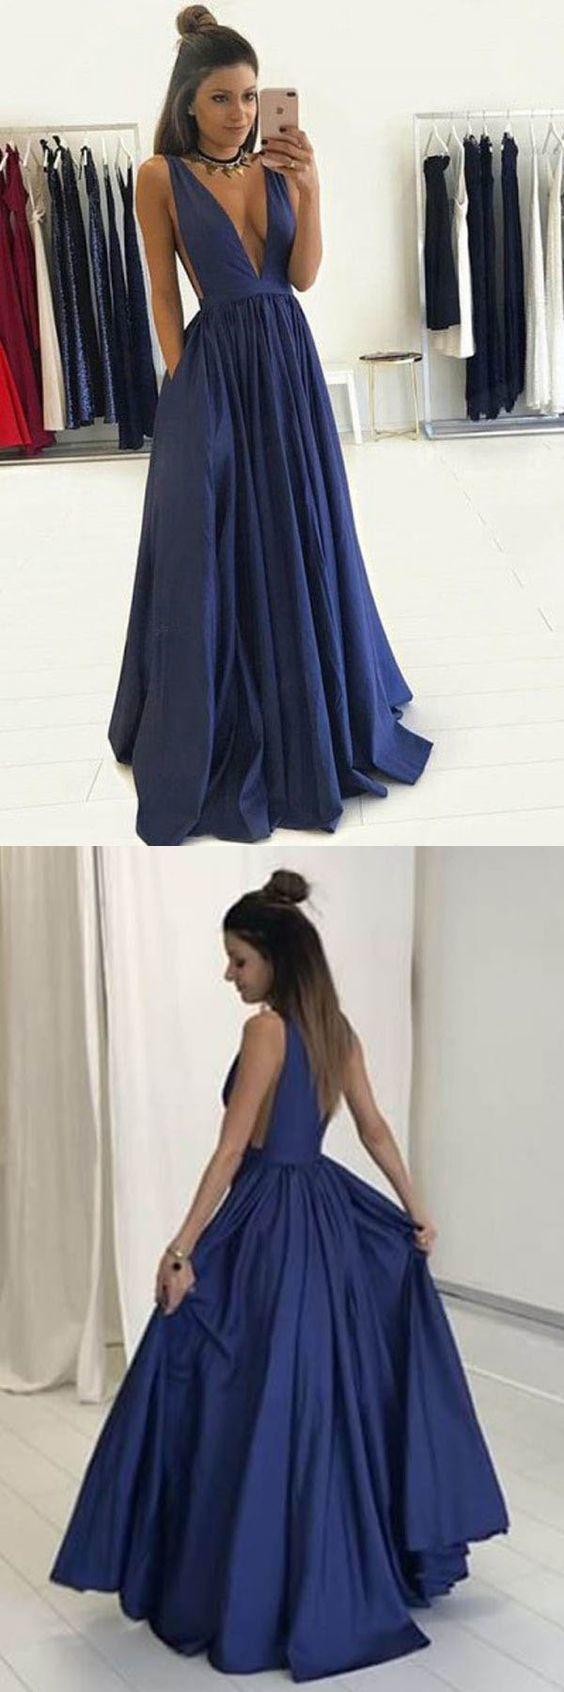 Deep vneck floorlength royal blue taffeta prom dress with pockets